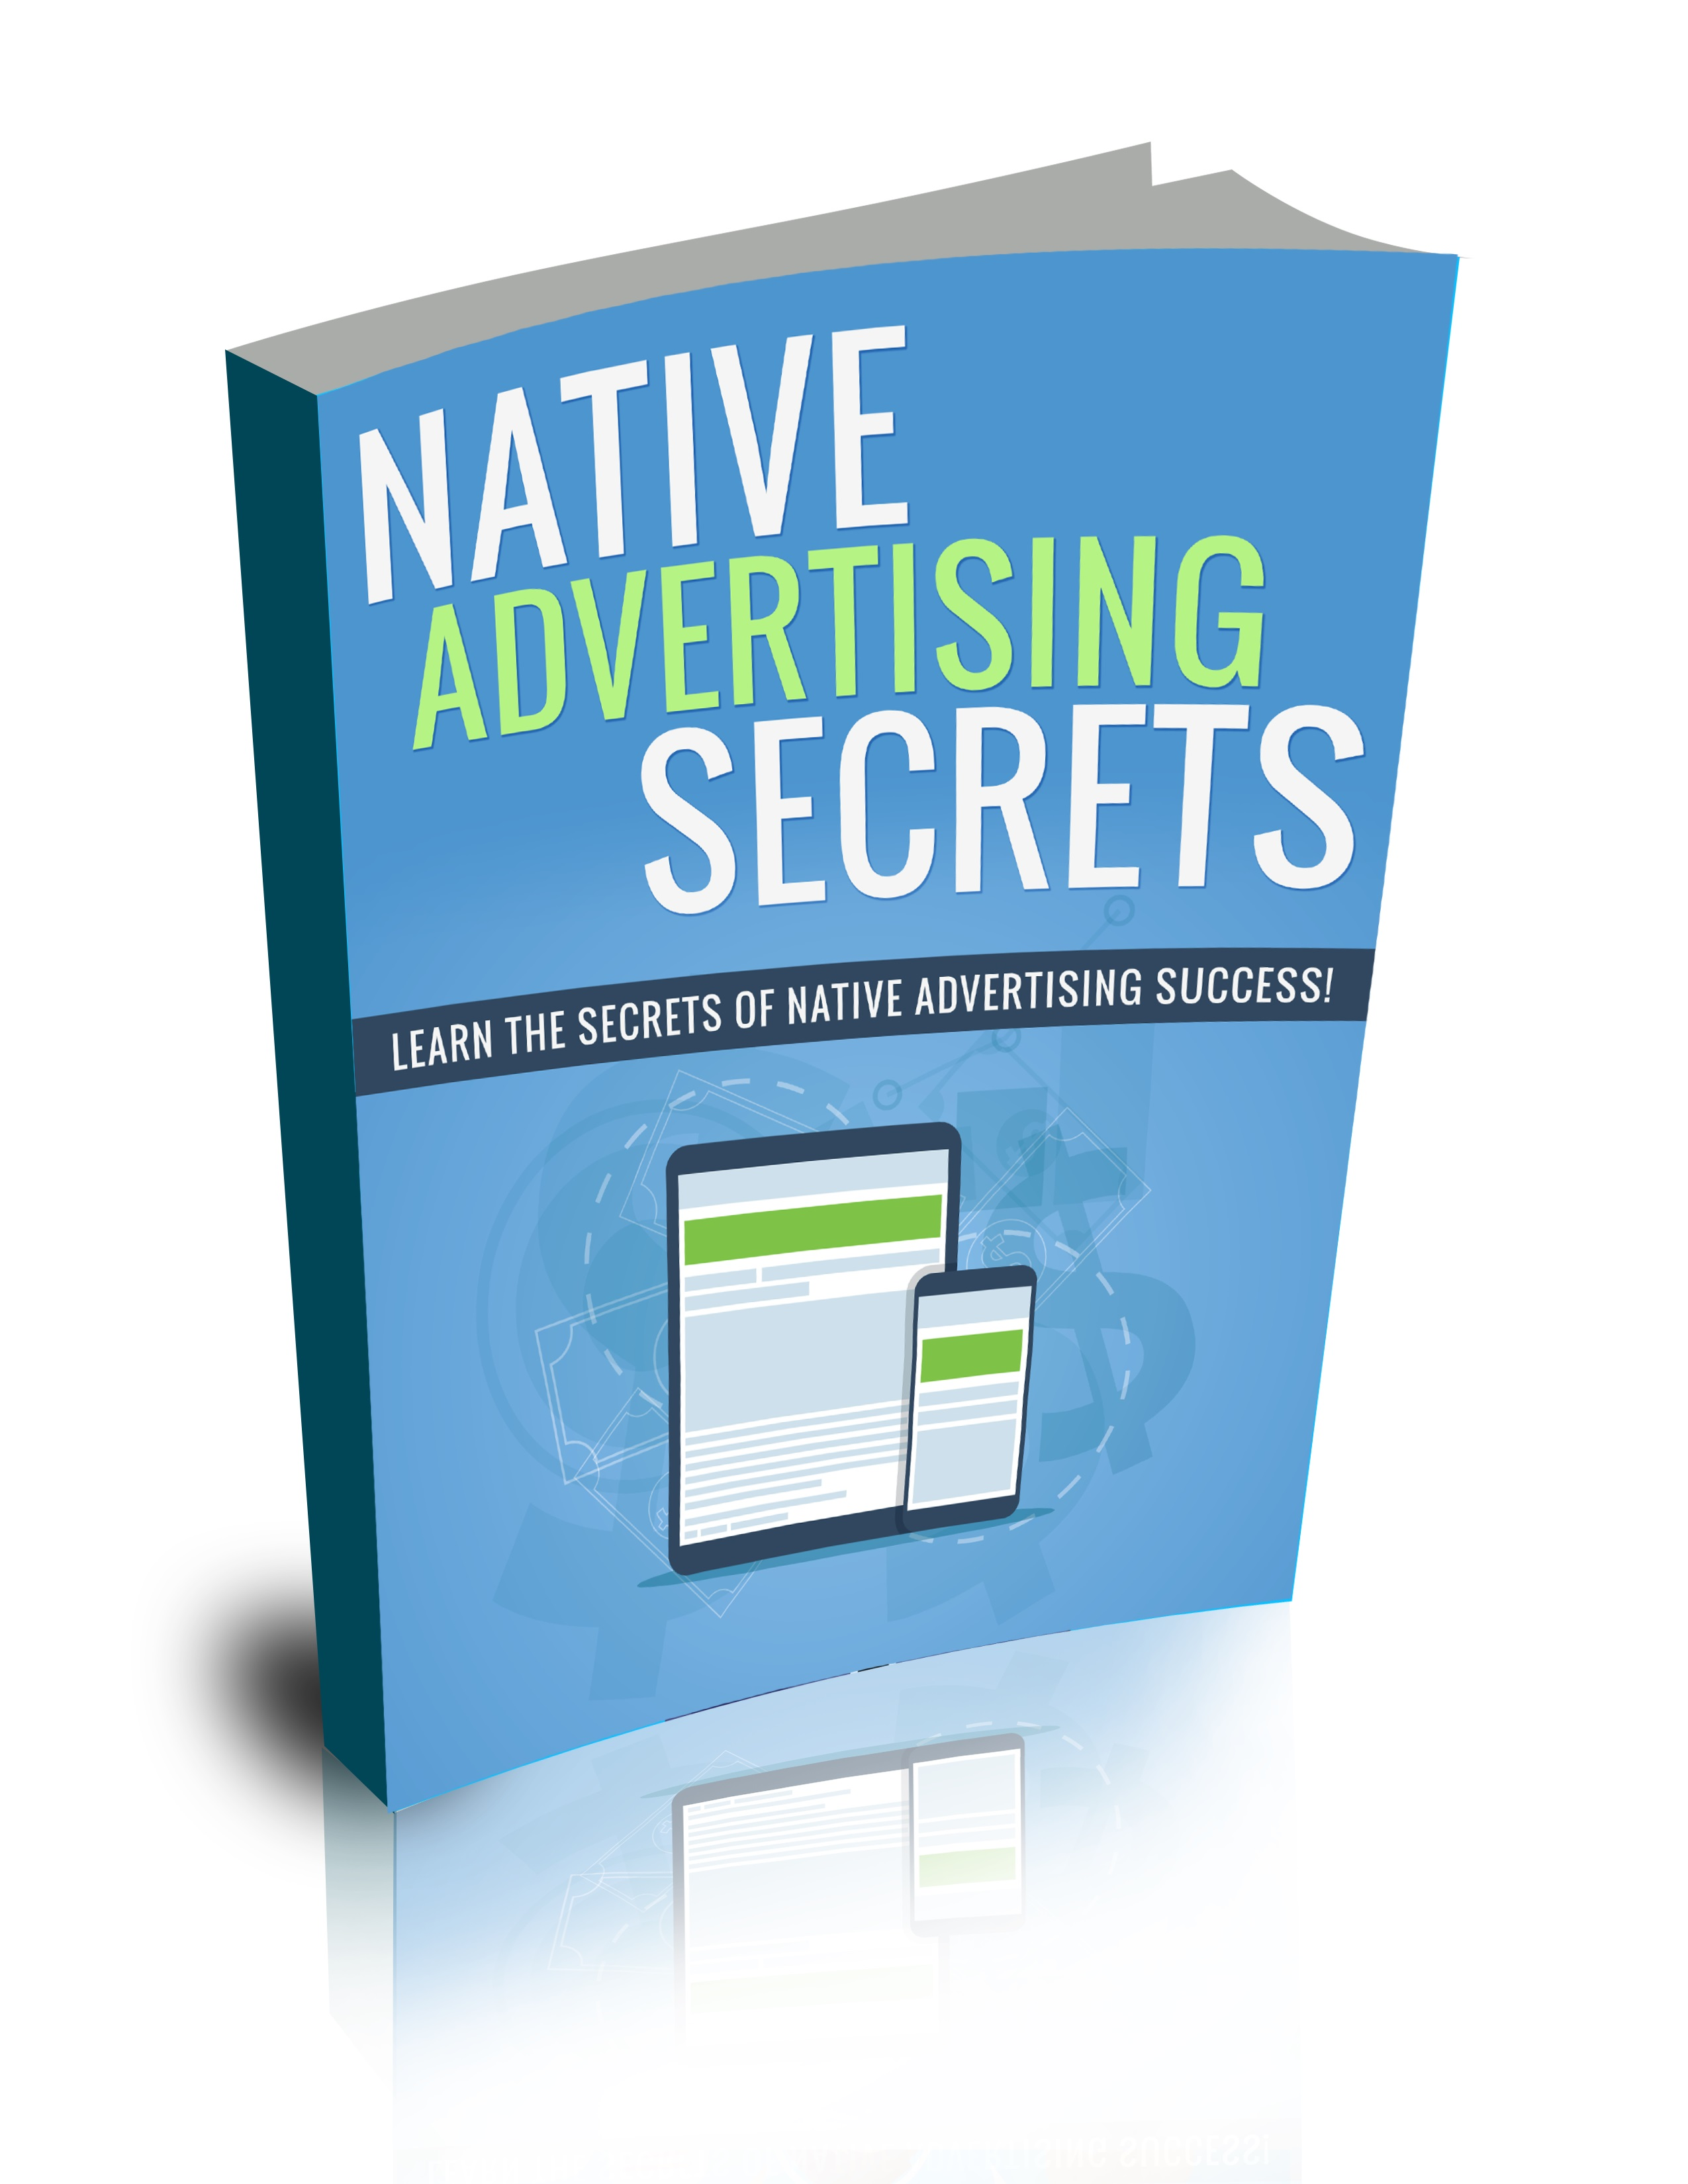 Native Advertising Secrets Package